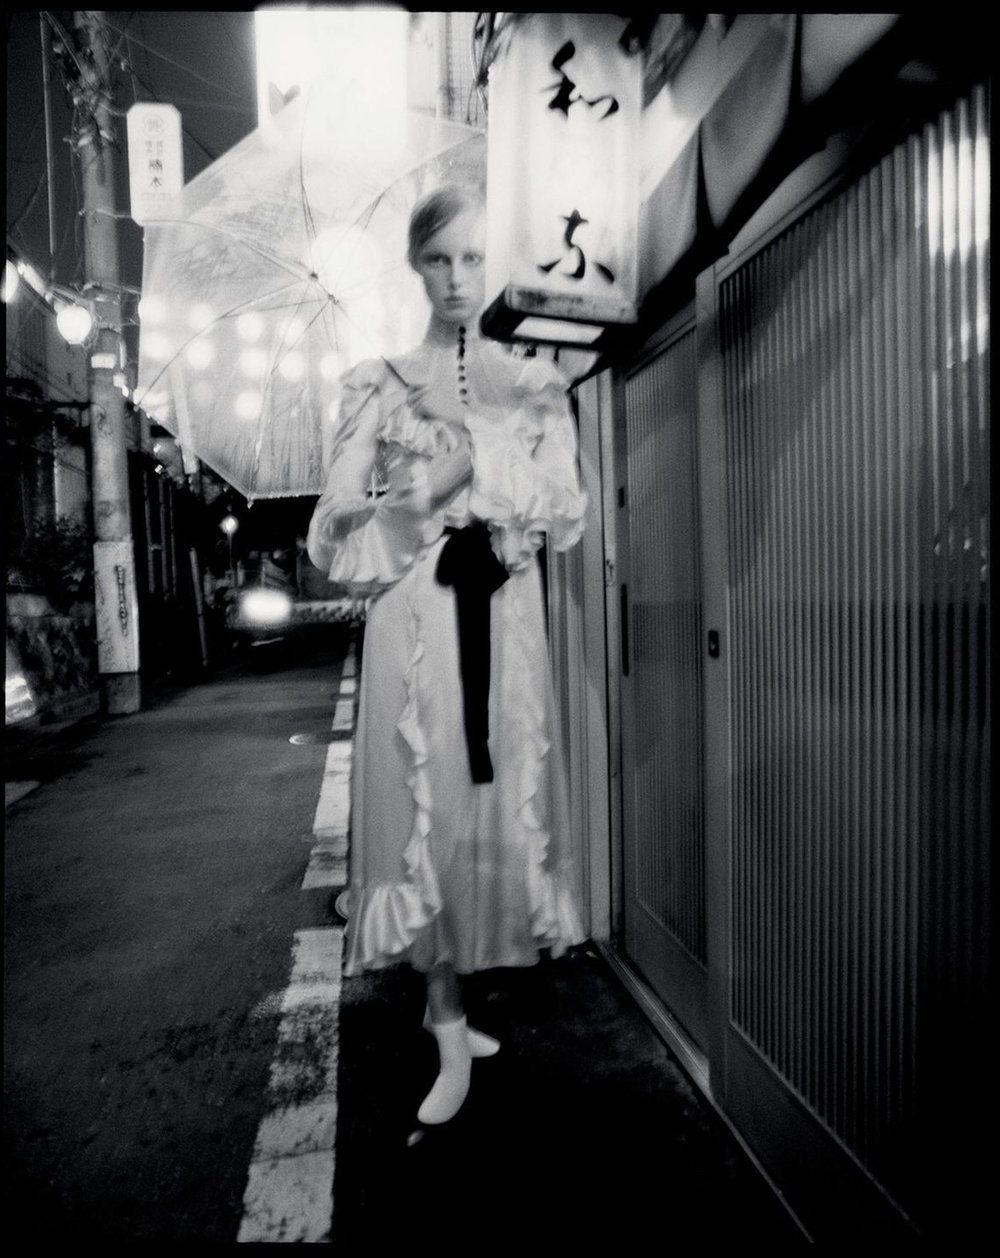 An artist of the floating world攝影大師 tim walker 首次造訪日本為英版